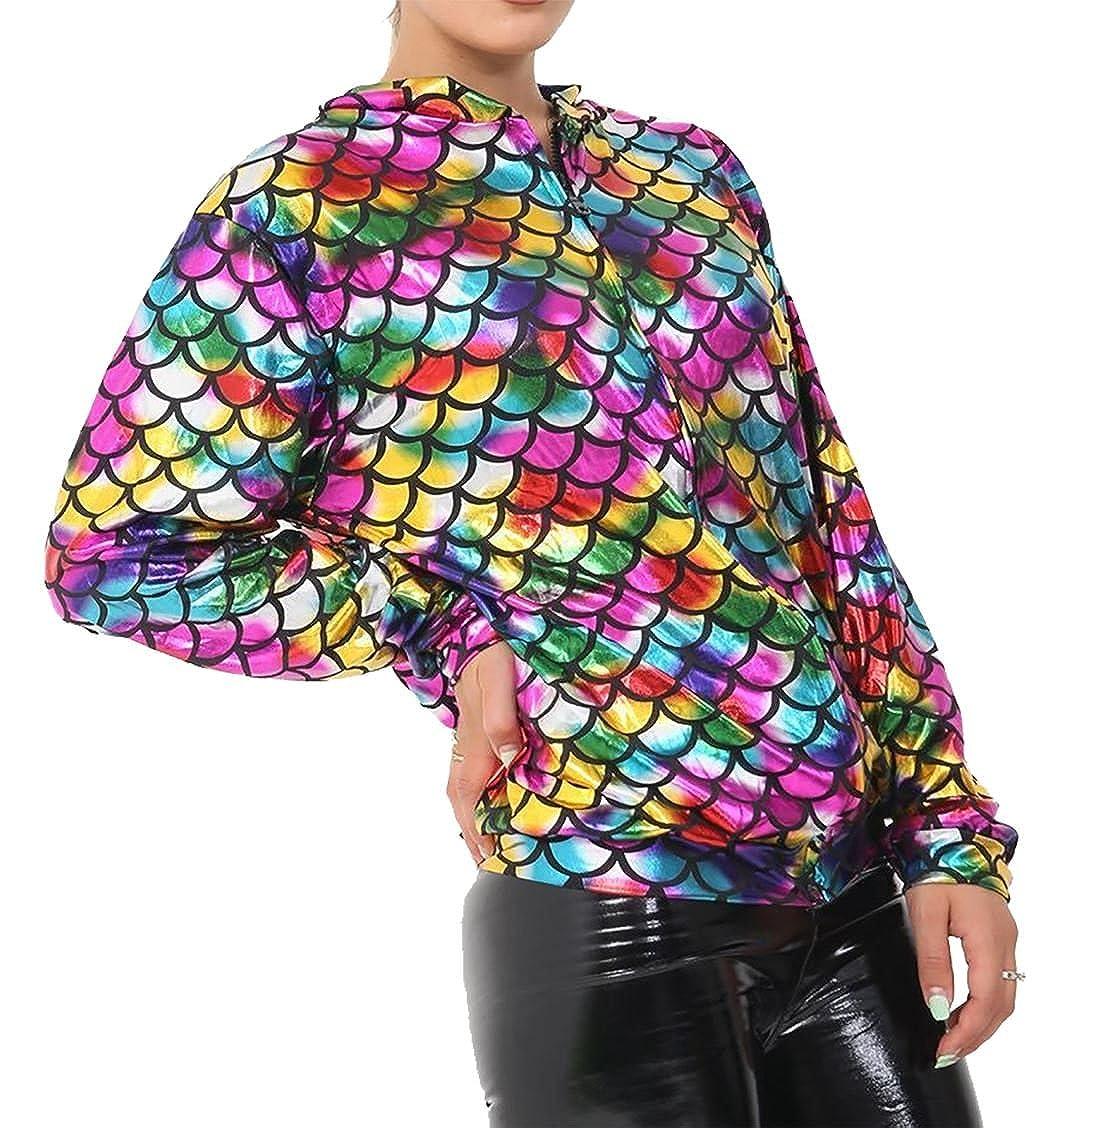 Amazon.com: Rimi Hanger Womens Mermaid Rainbow Fish Bomber Jacket Ladies Metallic Summer Party Coat S/XL: Clothing